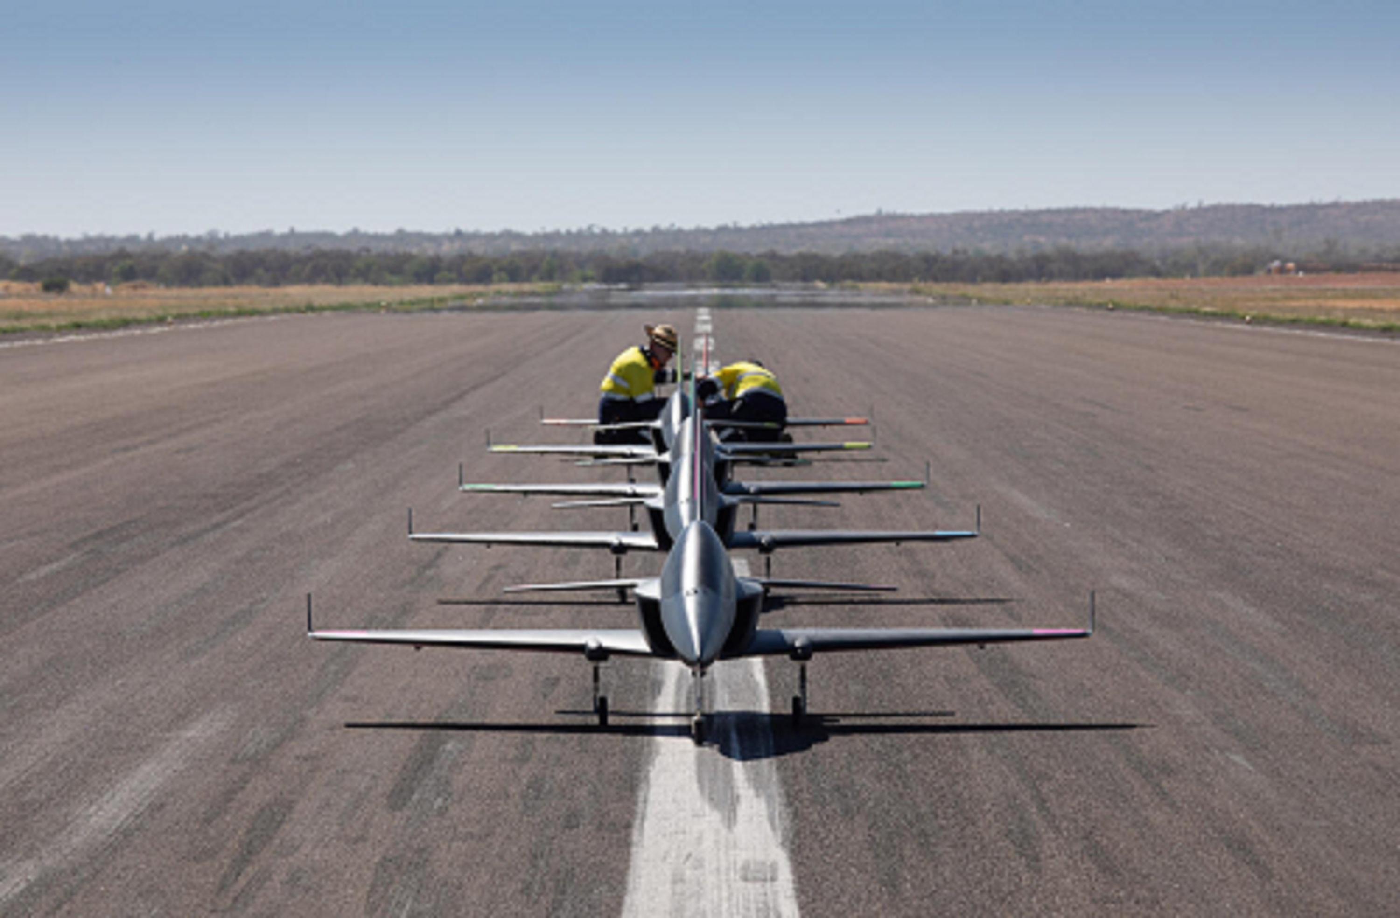 autonomiczne miniaturowe odrzutowce, autonomiczne miniaturowe odrzutowce Boeinga, autonomia Boeinga